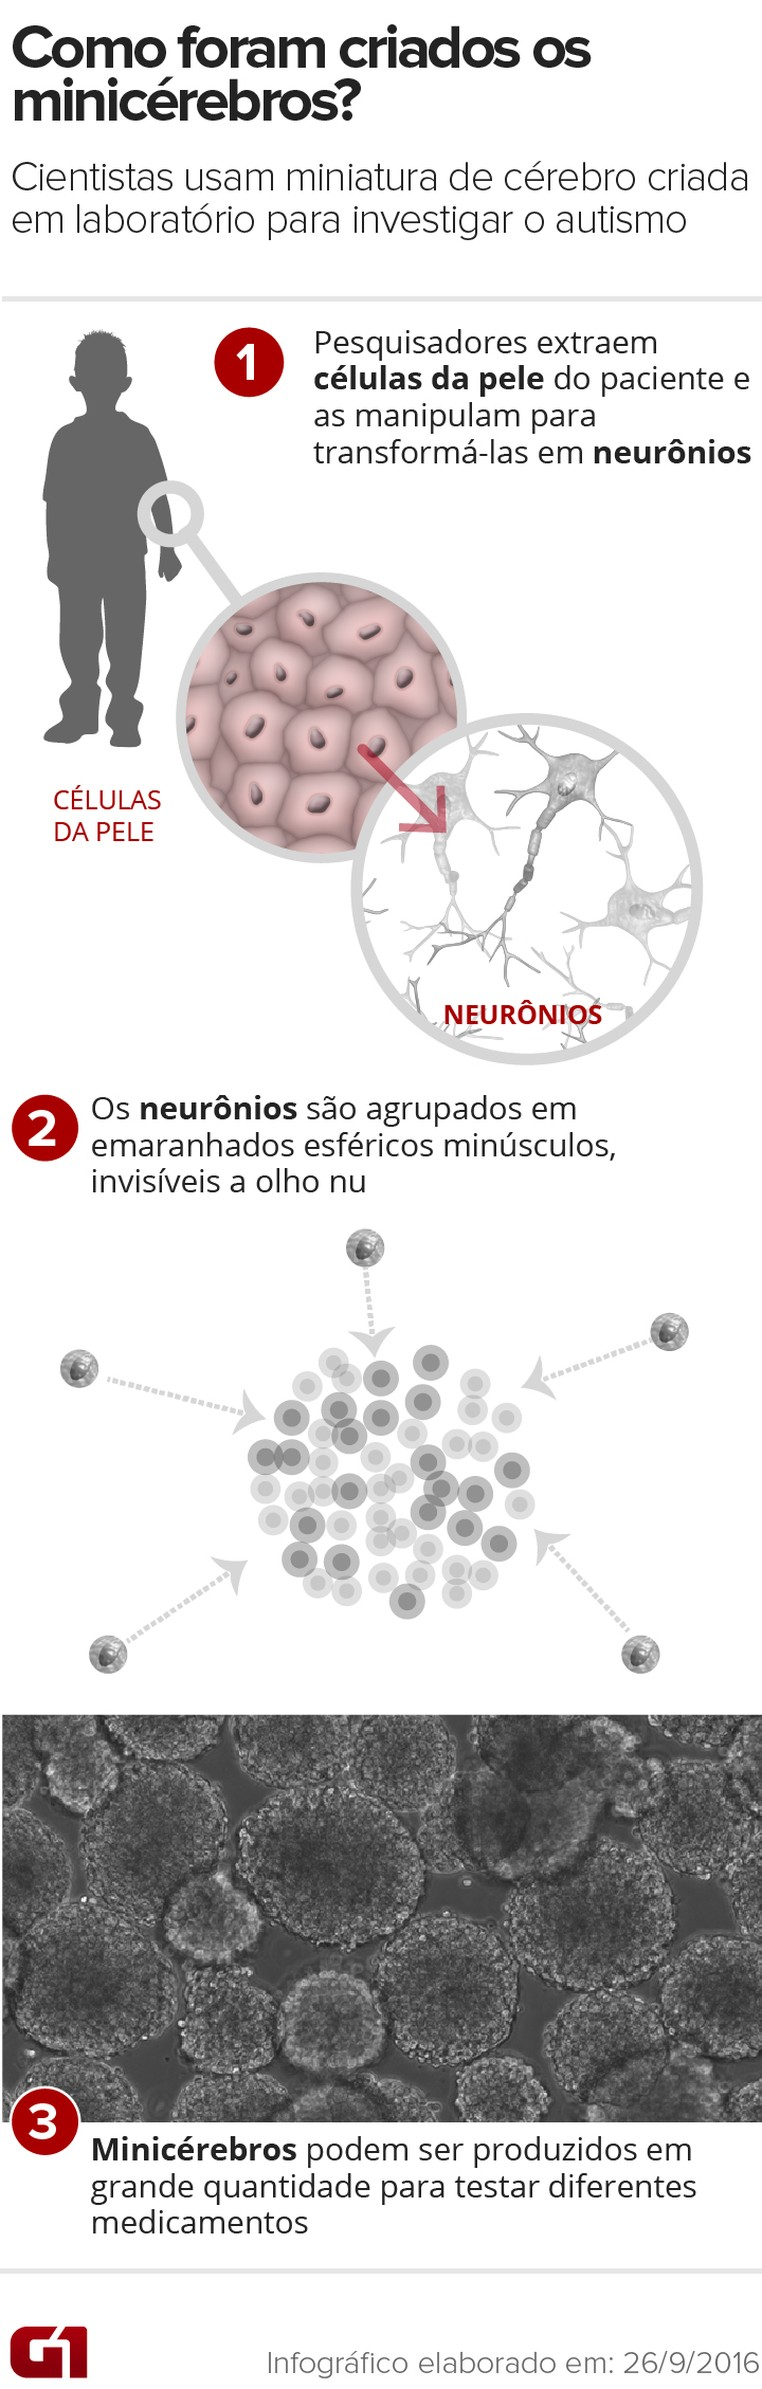 Minicérebros (Foto: Editoria de Arte/G1)